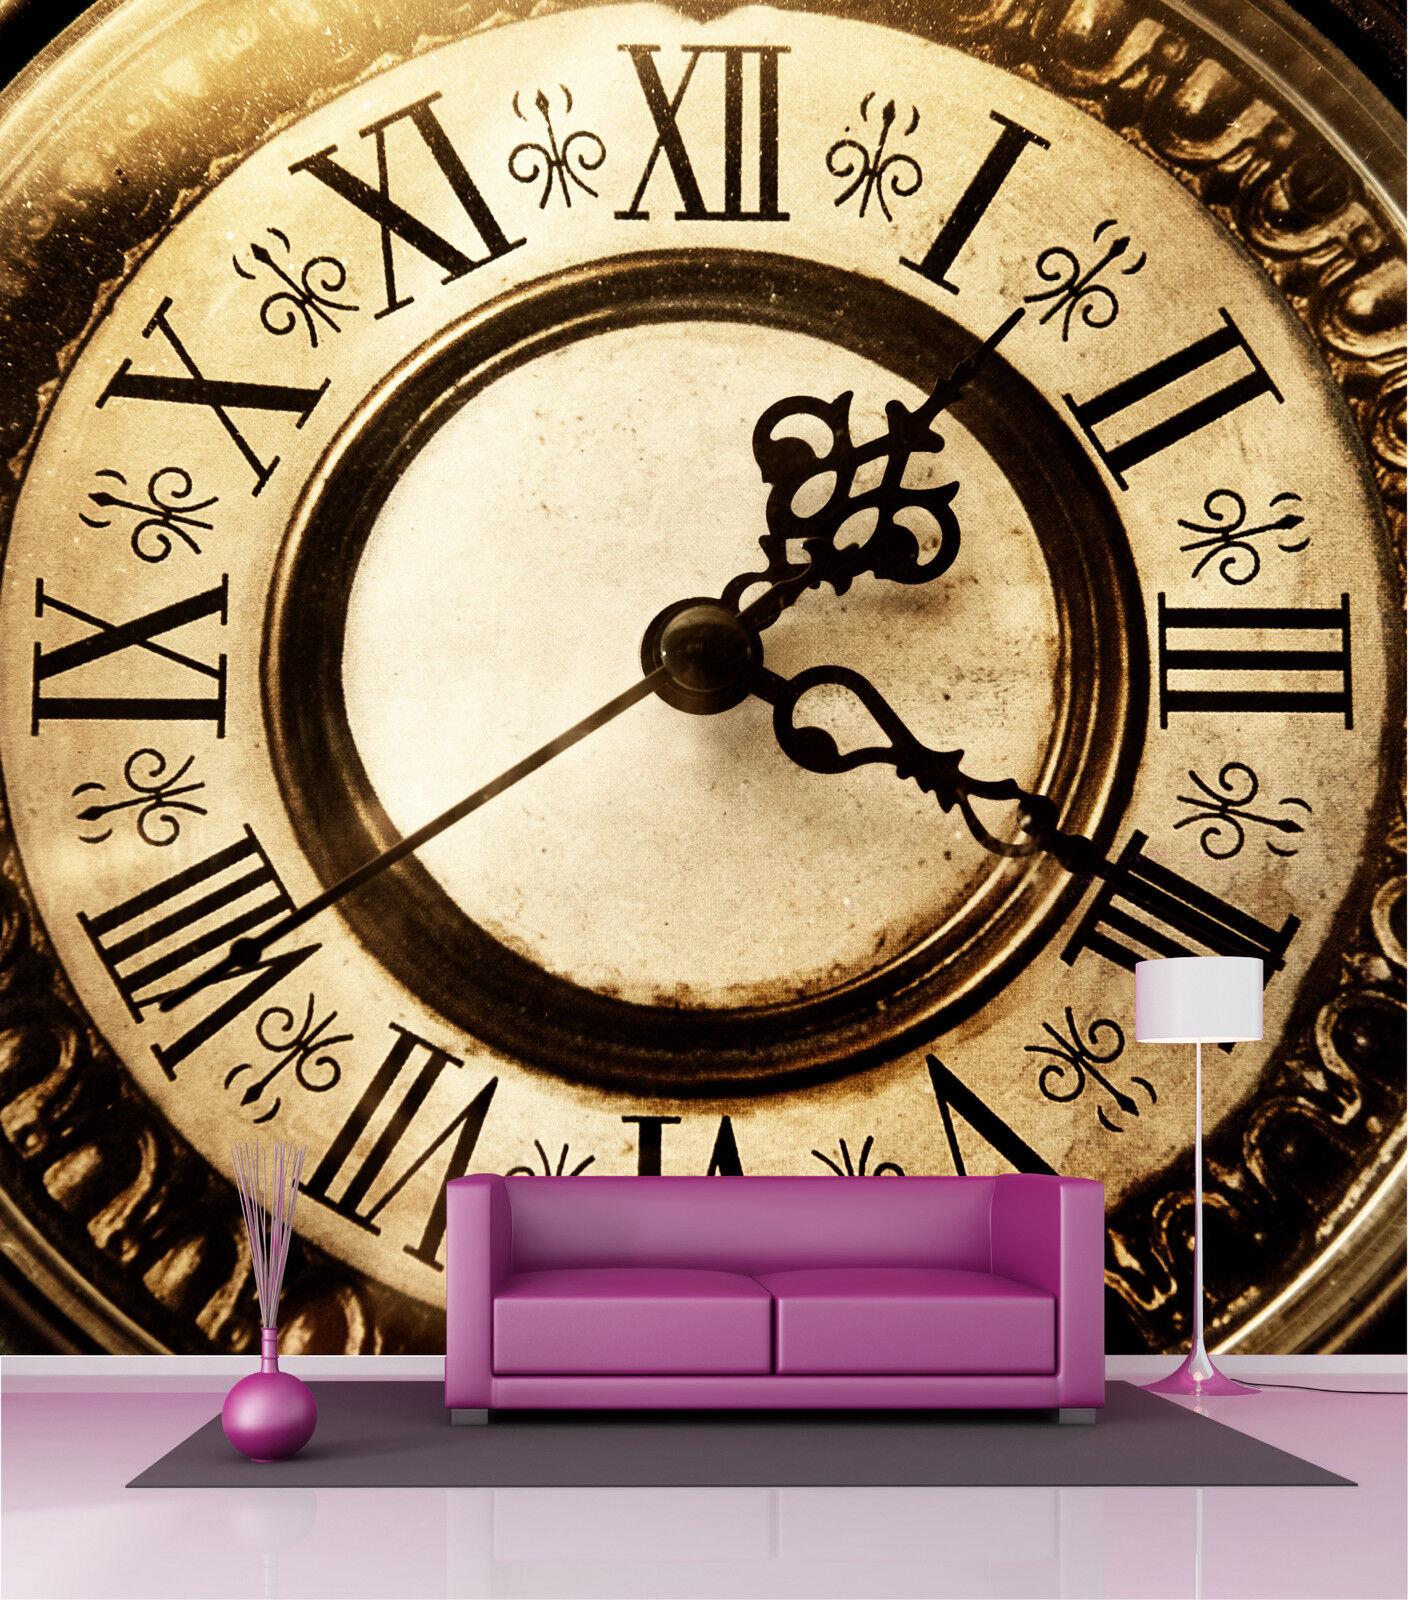 Adhesivo de Pared Gigante Reloj 260x270cm P142